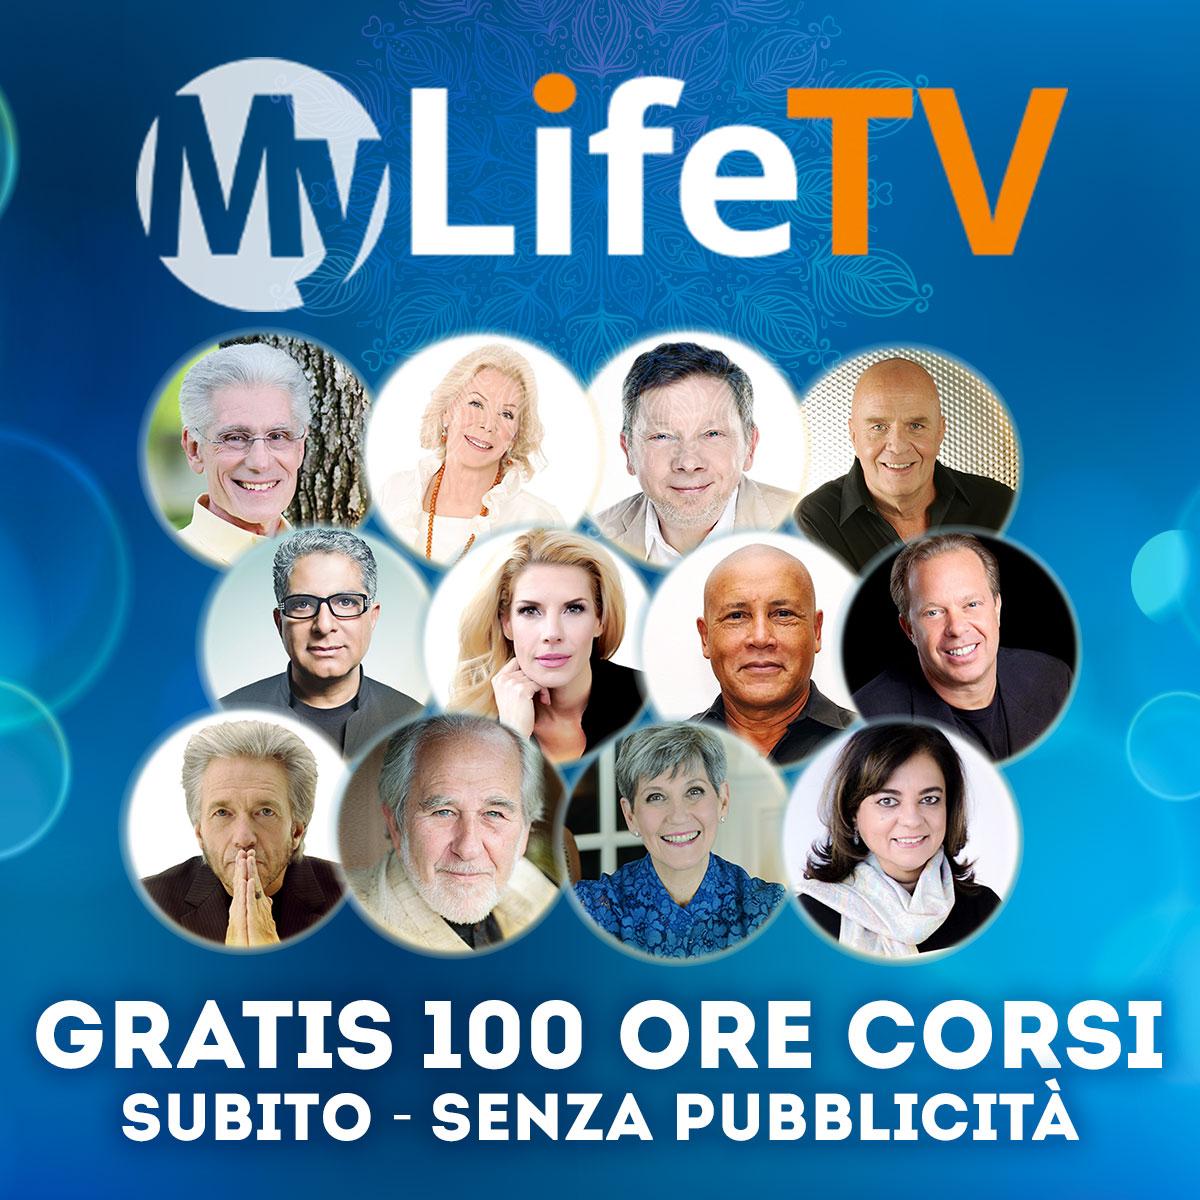 banner-adwords-mylifetv-100-ore-corsi-1-1